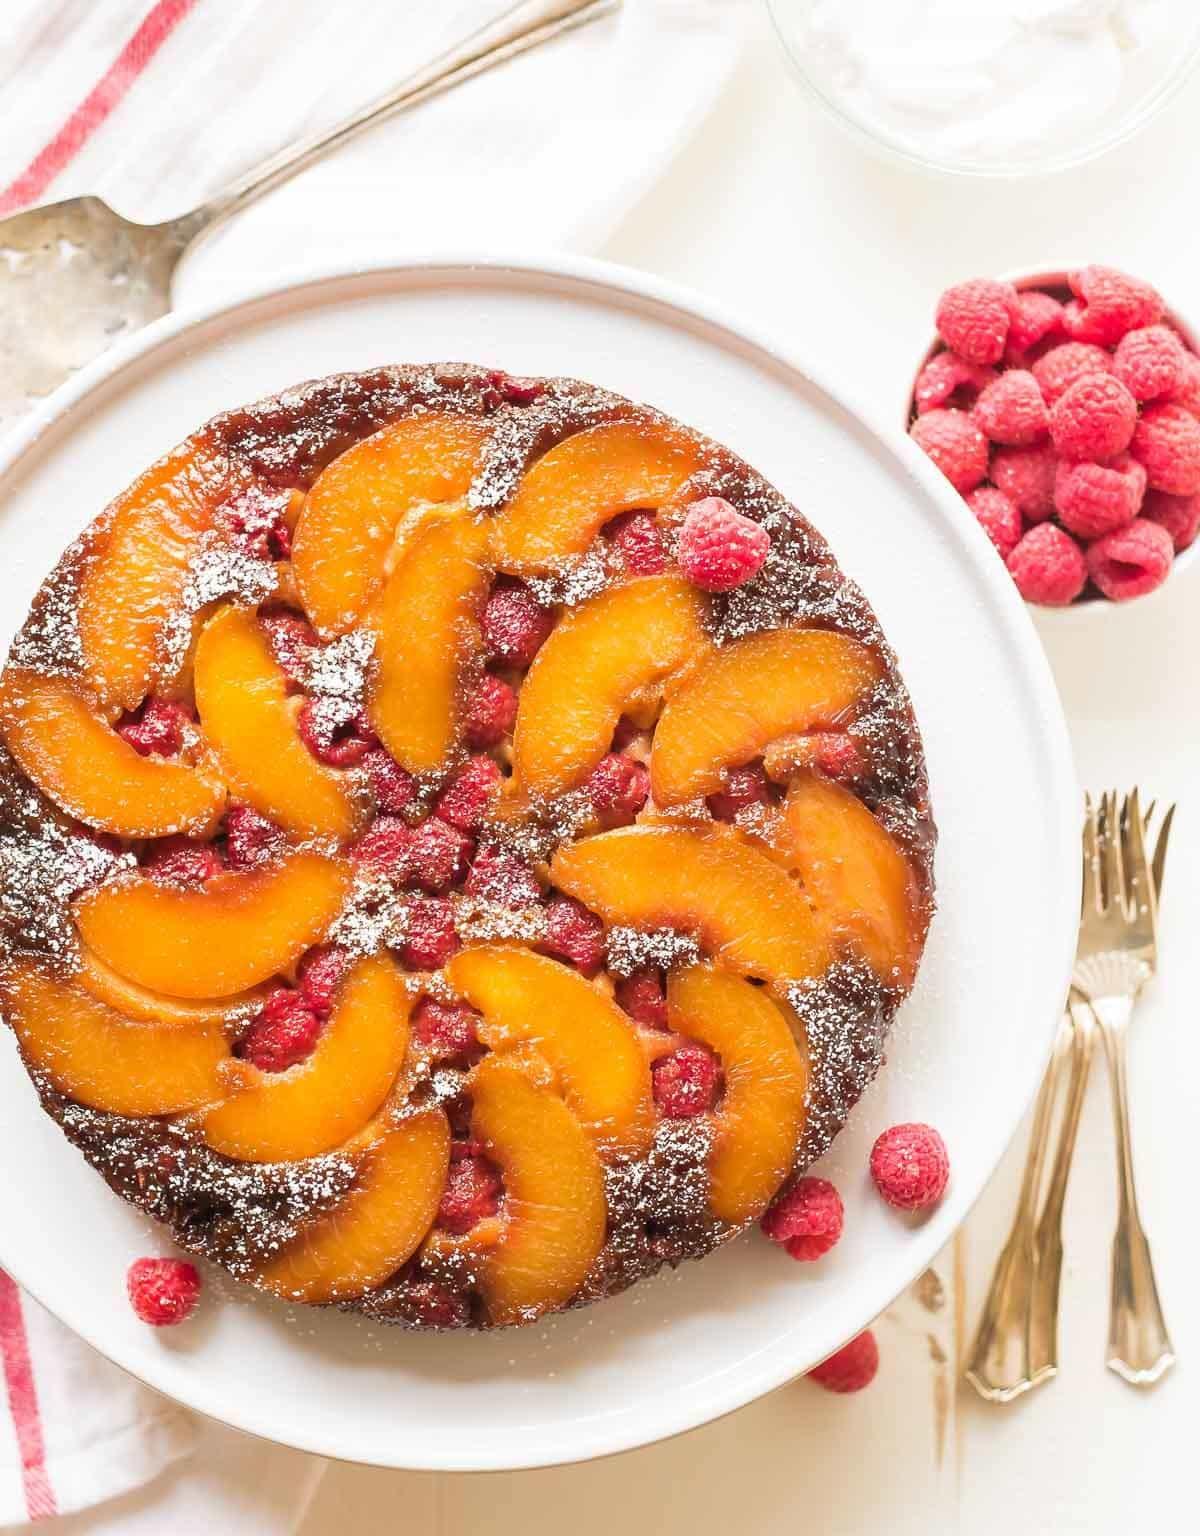 Unbelievable Peach Upside Down Cake with fresh raspberries.